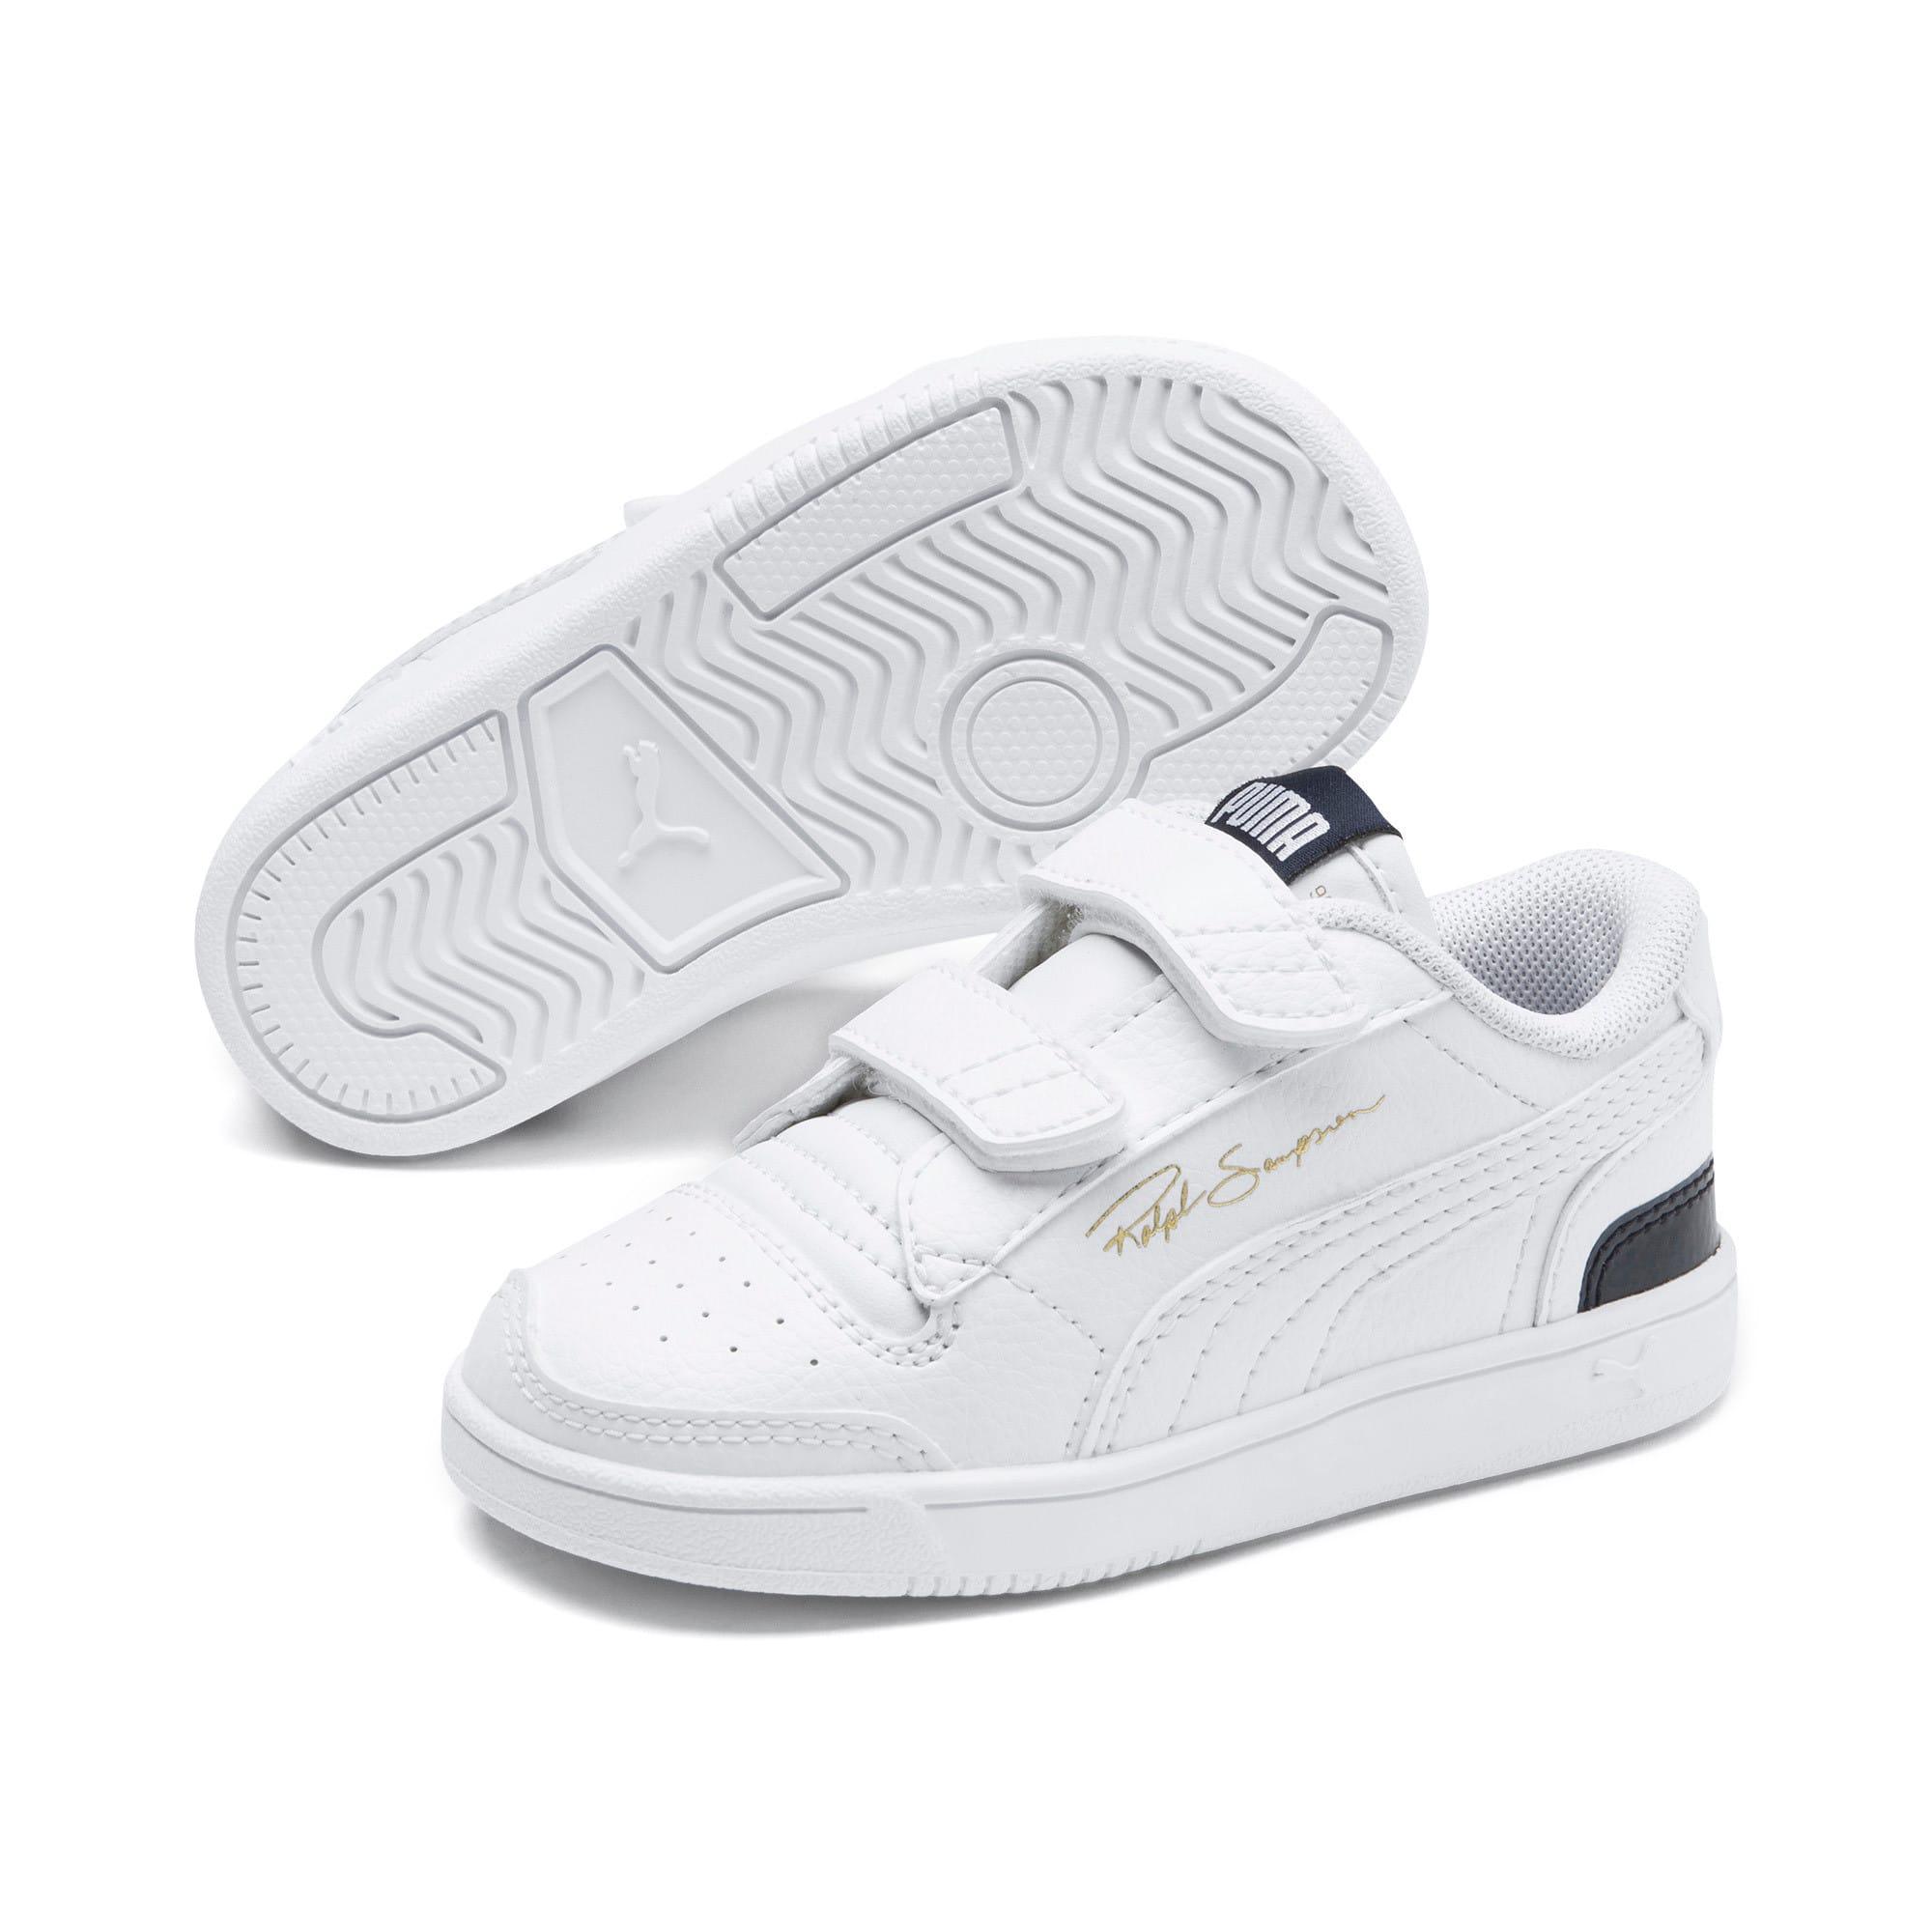 Thumbnail 2 of Ralph Sampson Low AC Toddler Shoes, White-Peacoat-White, medium